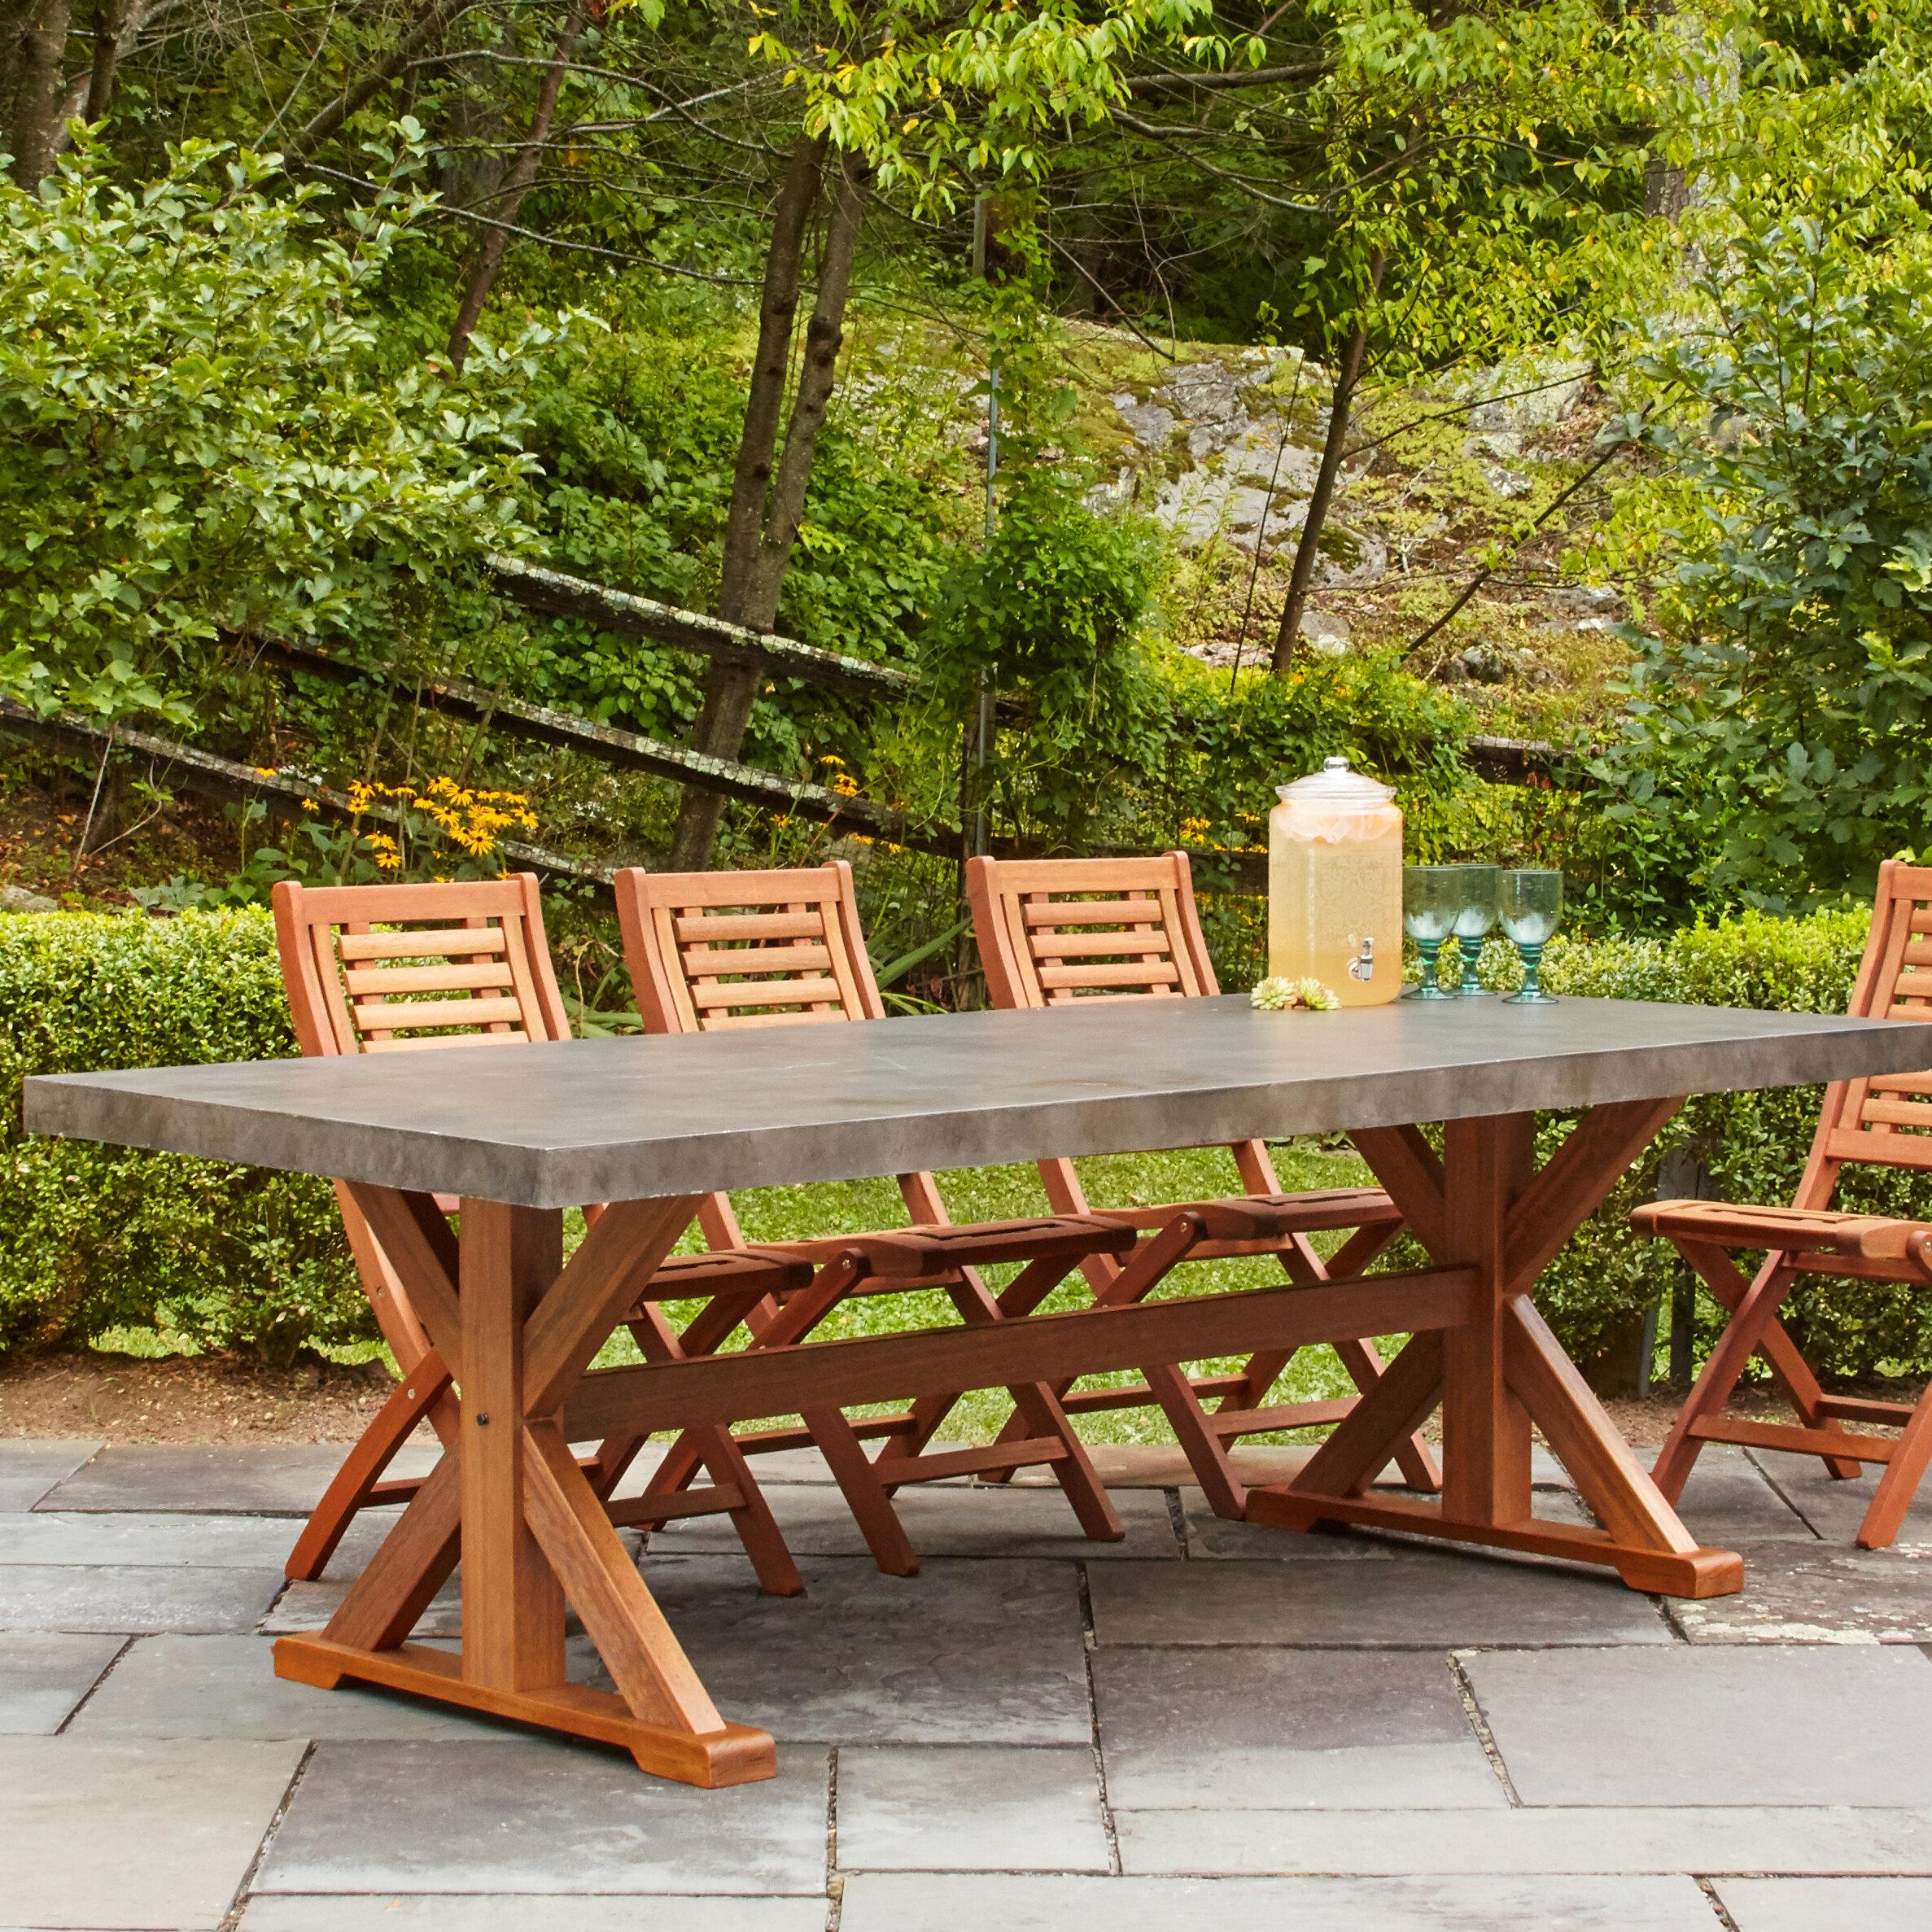 Groovy Broxton Dining Table Beatyapartments Chair Design Images Beatyapartmentscom